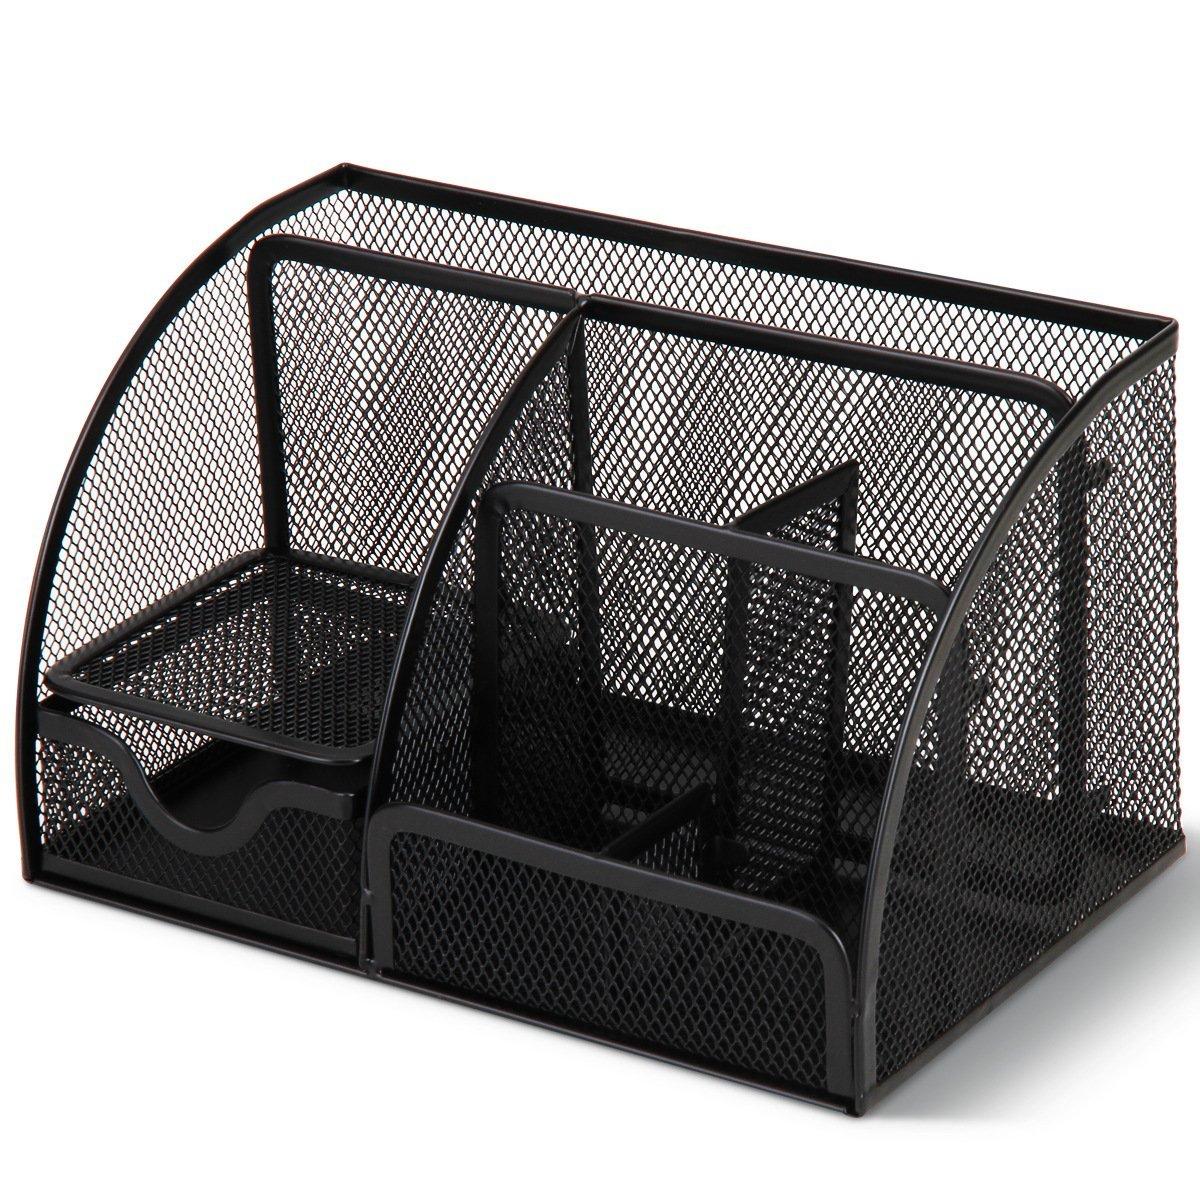 Tmarton Features Elegant Metal Wire Mesh Office School Supply Desktop Organizer Caddy,6Compartment With 1Drawer, Black